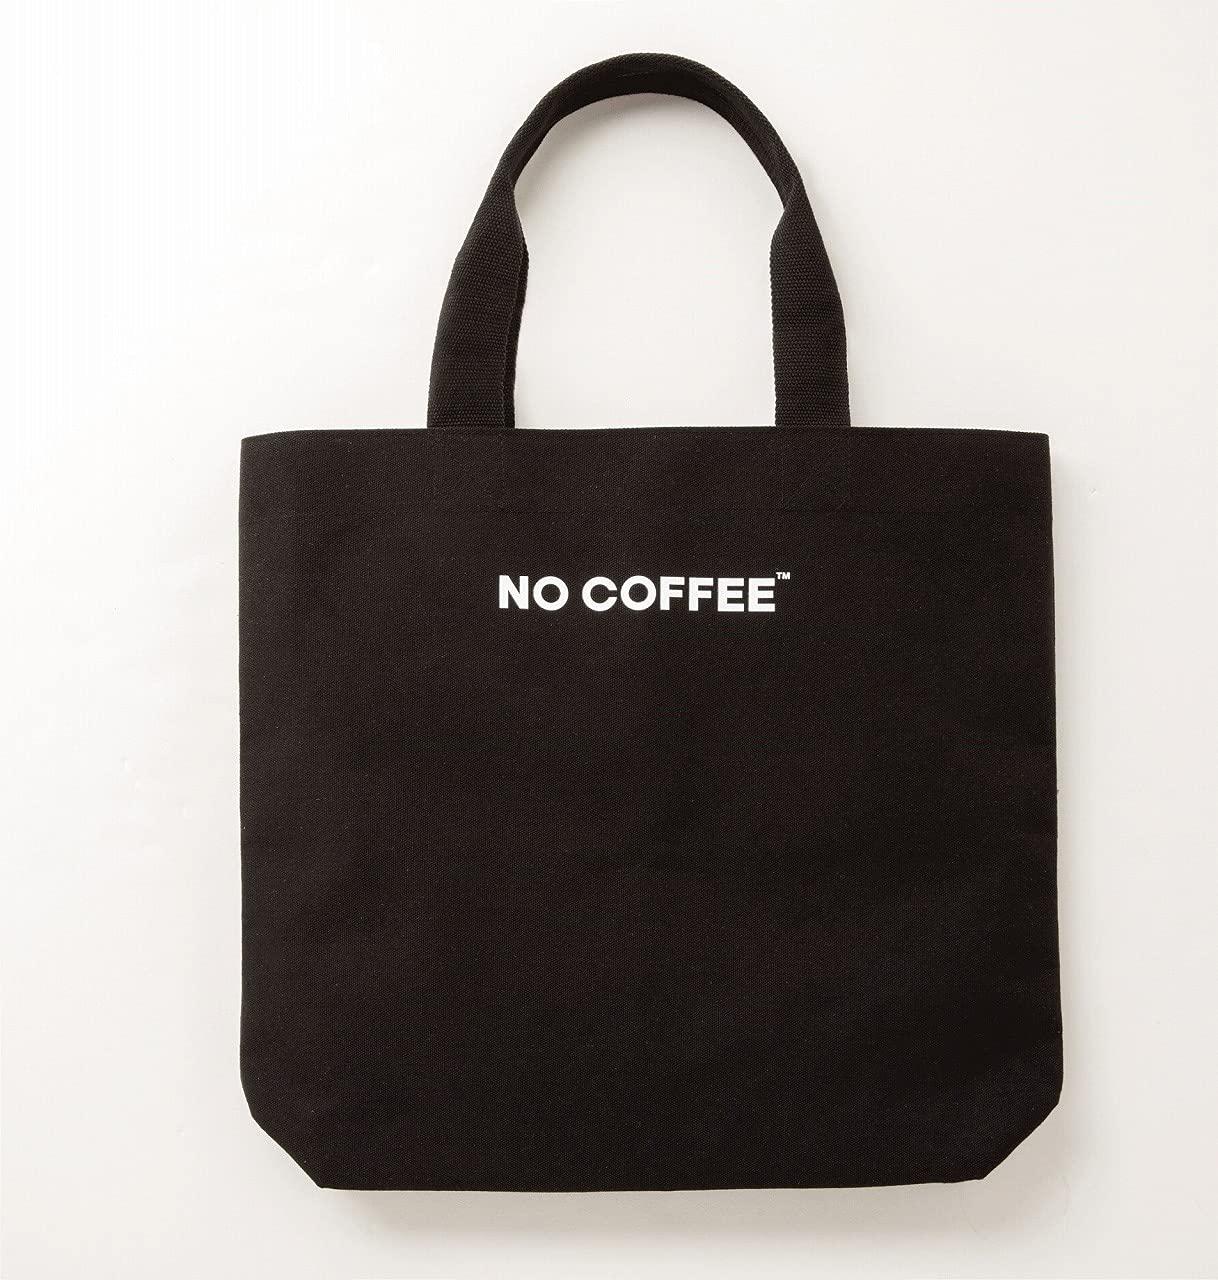 NO COFFEE BIG TOTE BAG BOOK:7/26発売【ムック本付録】ノー コーヒー ビッグトートバッグ